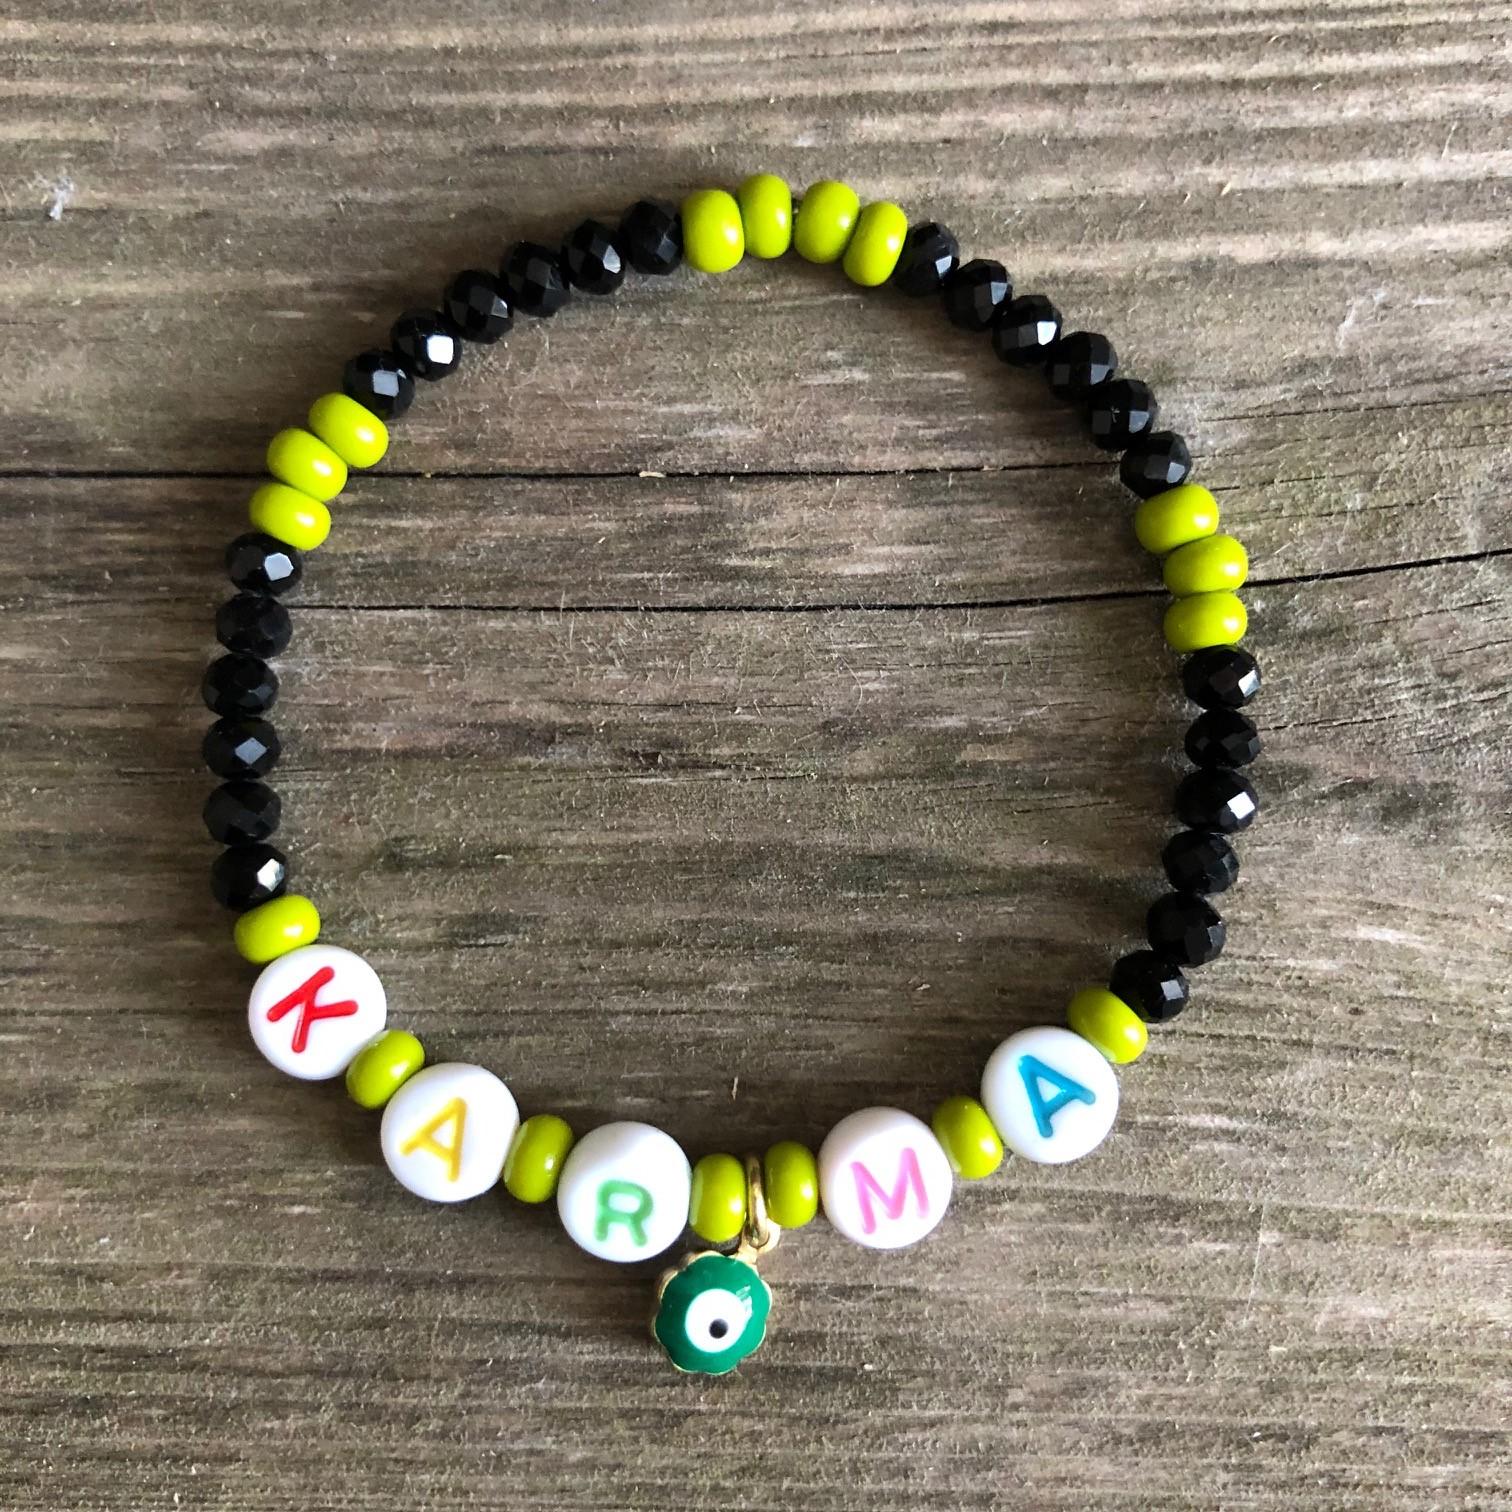 handgefertigtes Perlen-Armband